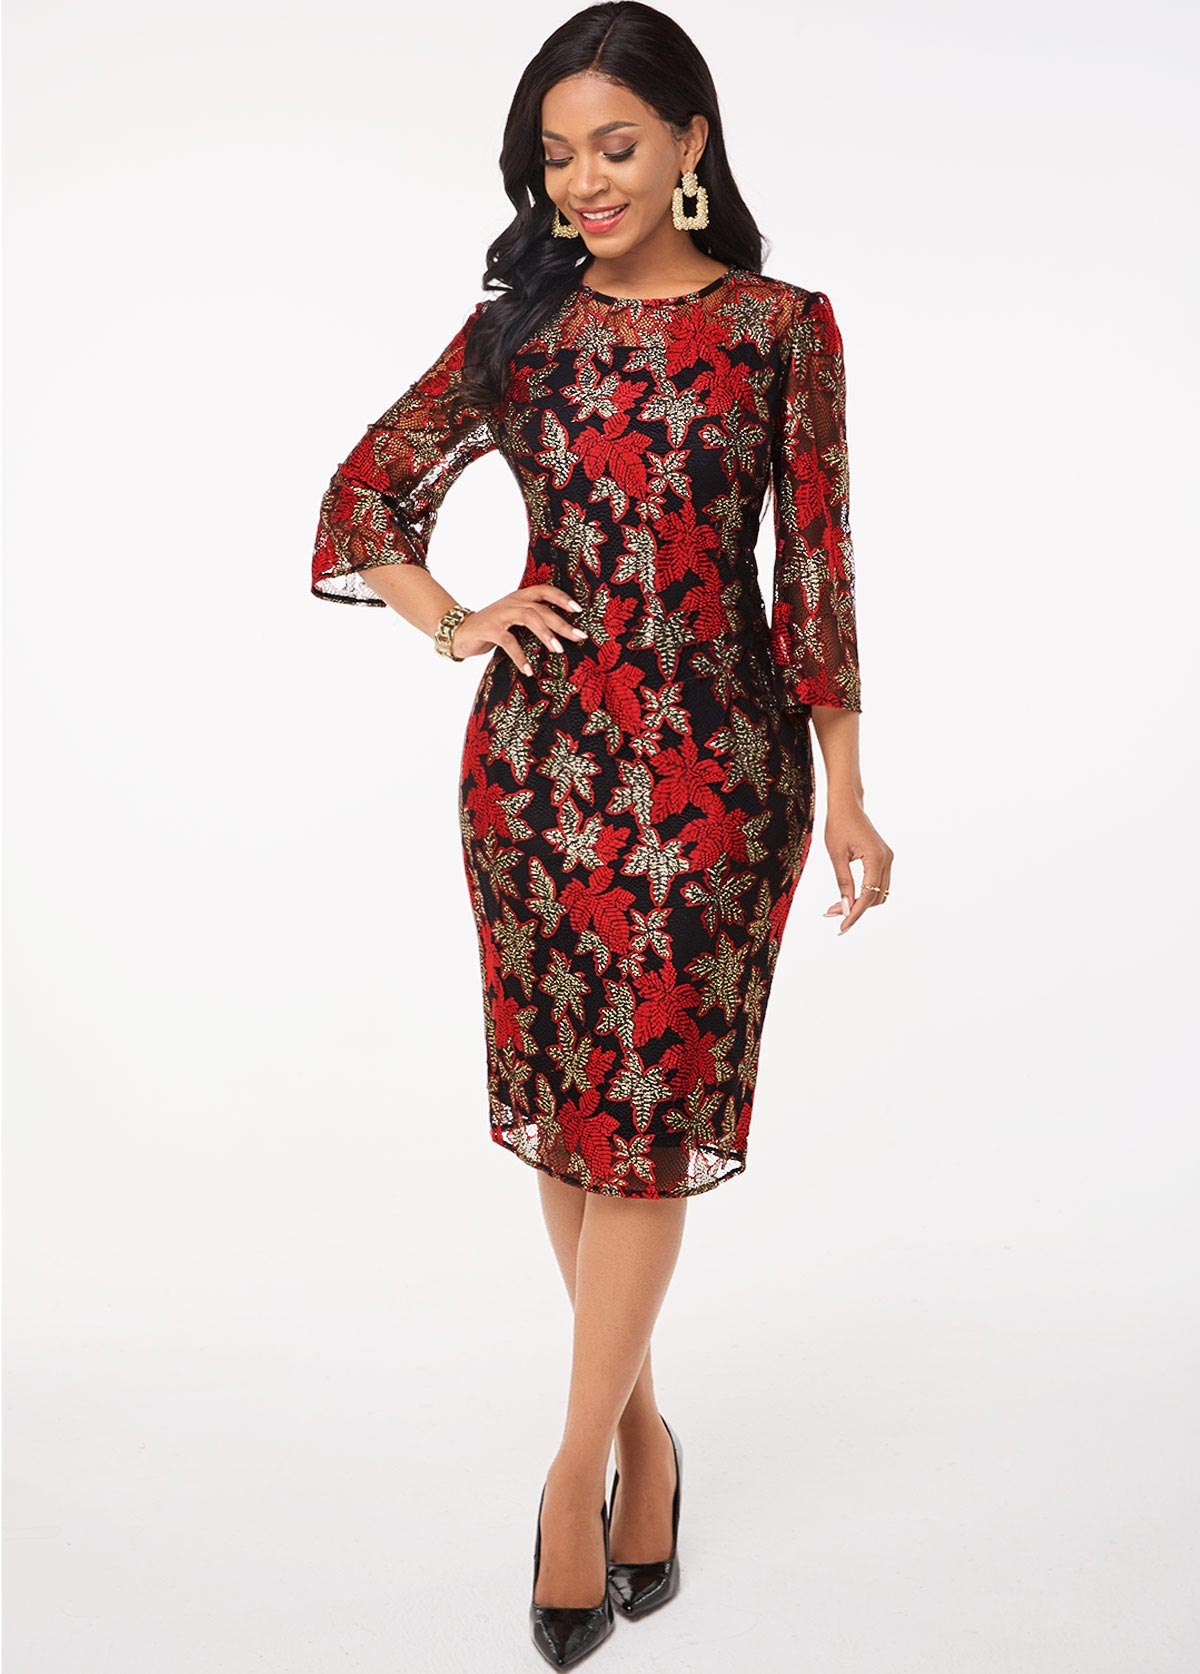 Lace Stitching Round Neck 3/4 Sleeve Dress